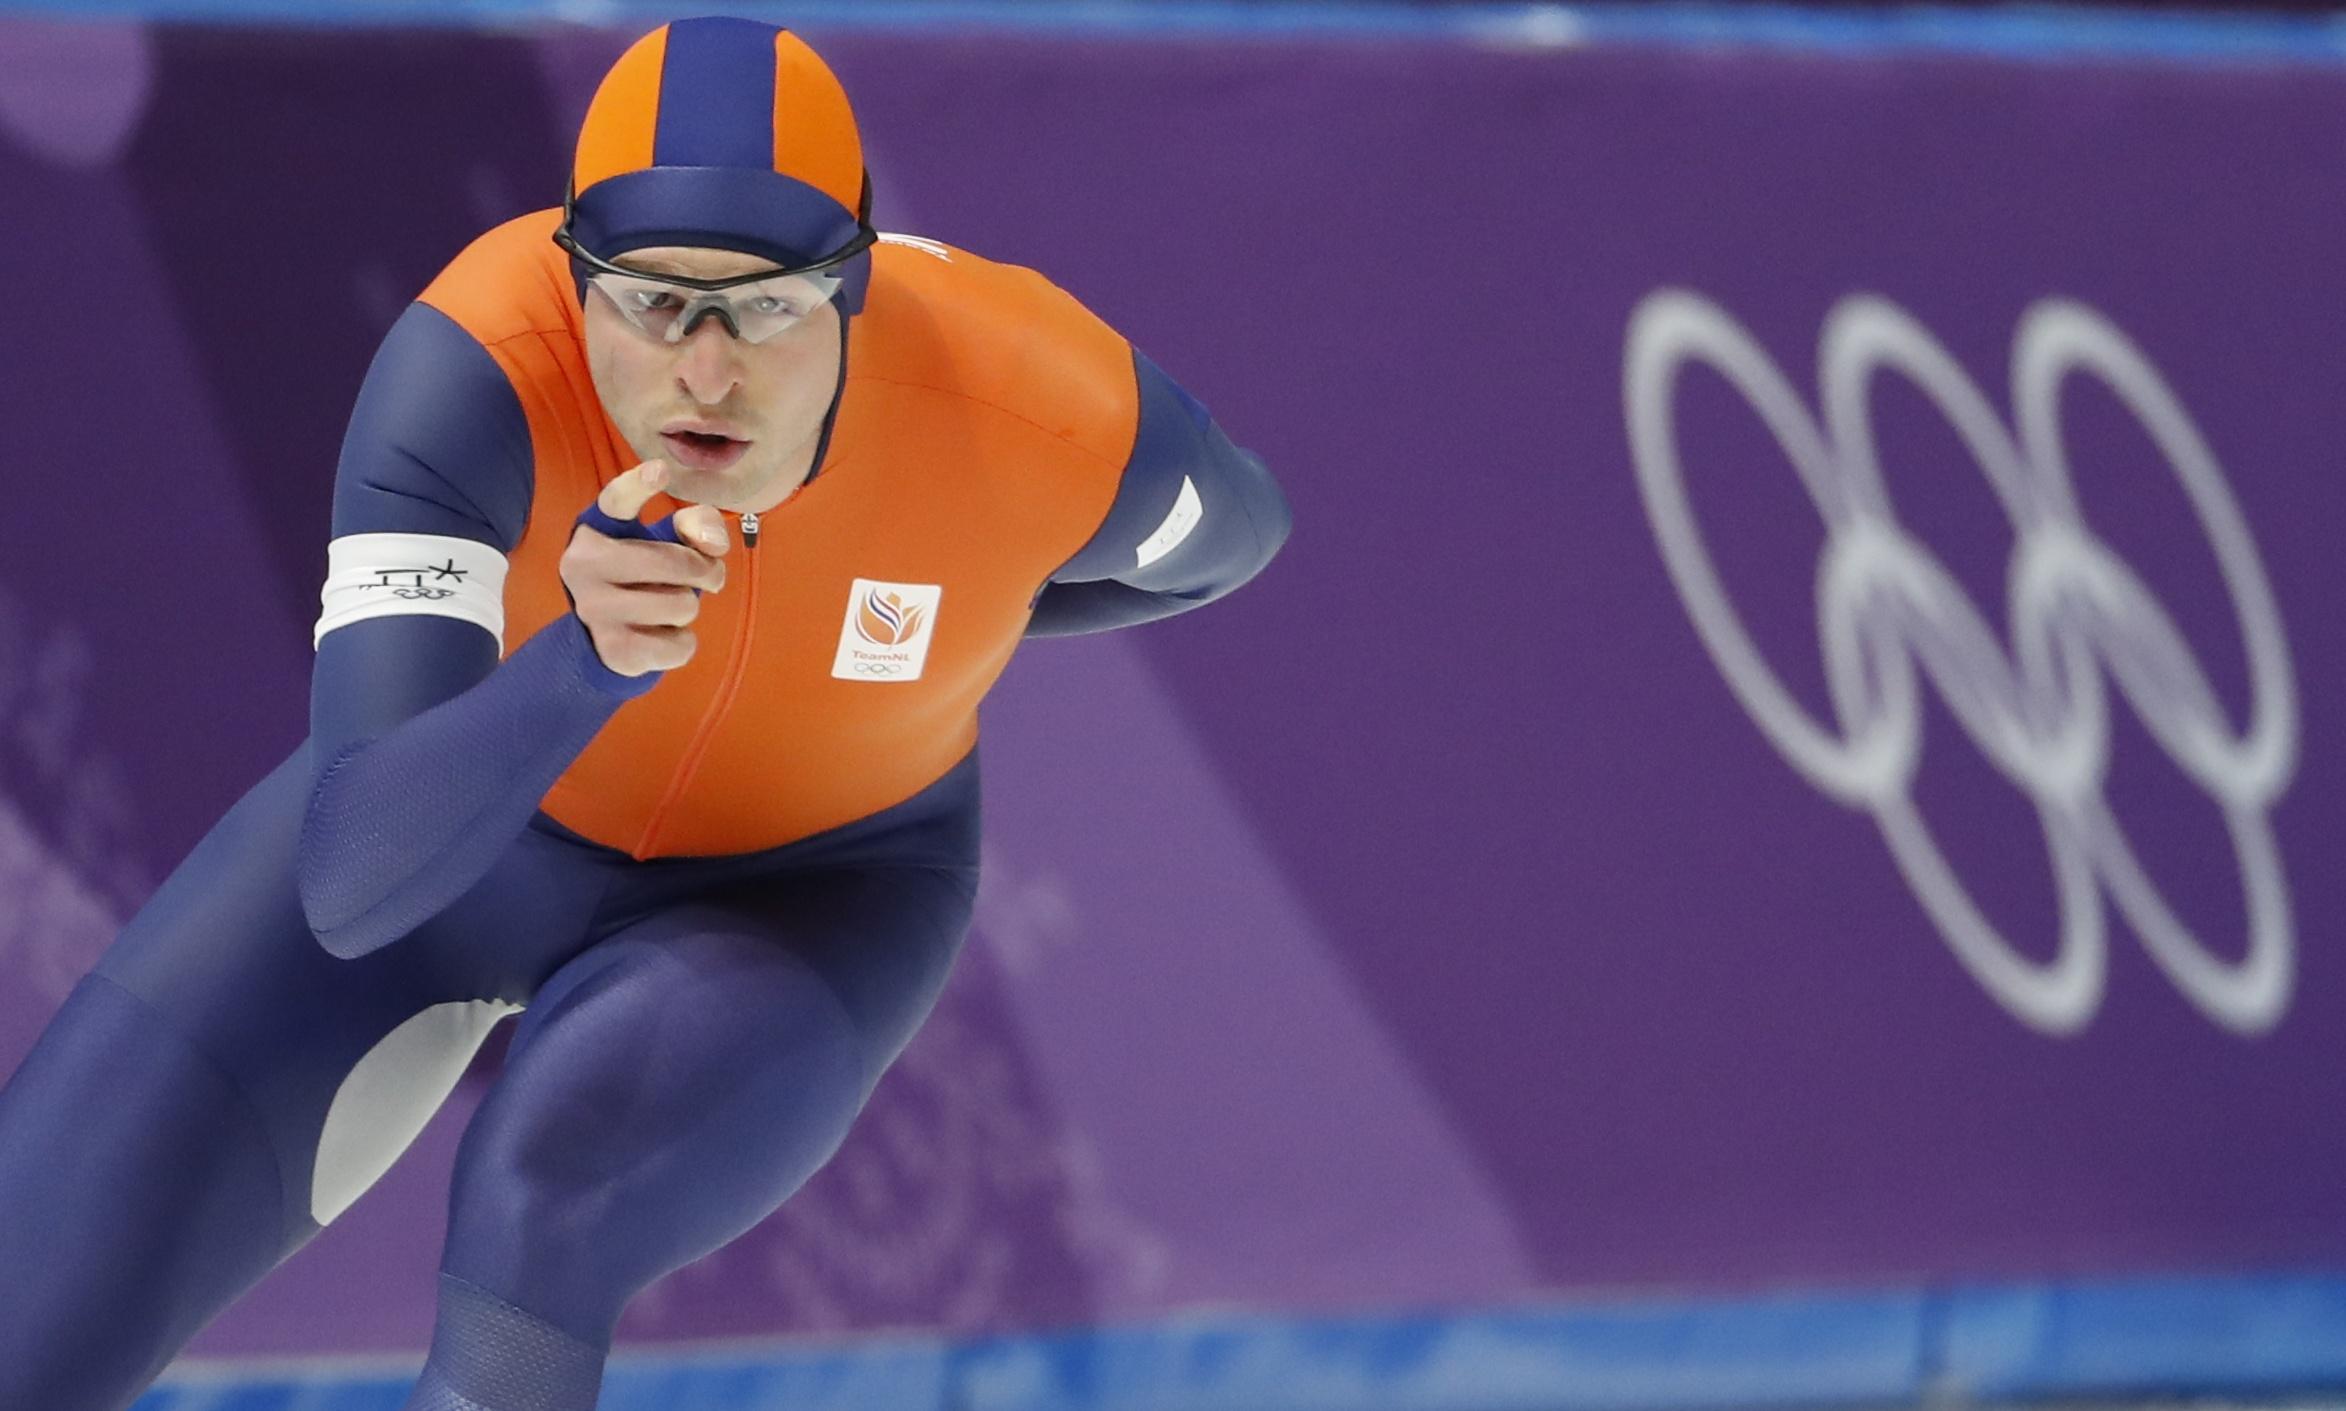 Jeux olympiques - Pyeongchang 2018 - JO 2018 : Sven Kramer, roi du patinage de vitesse